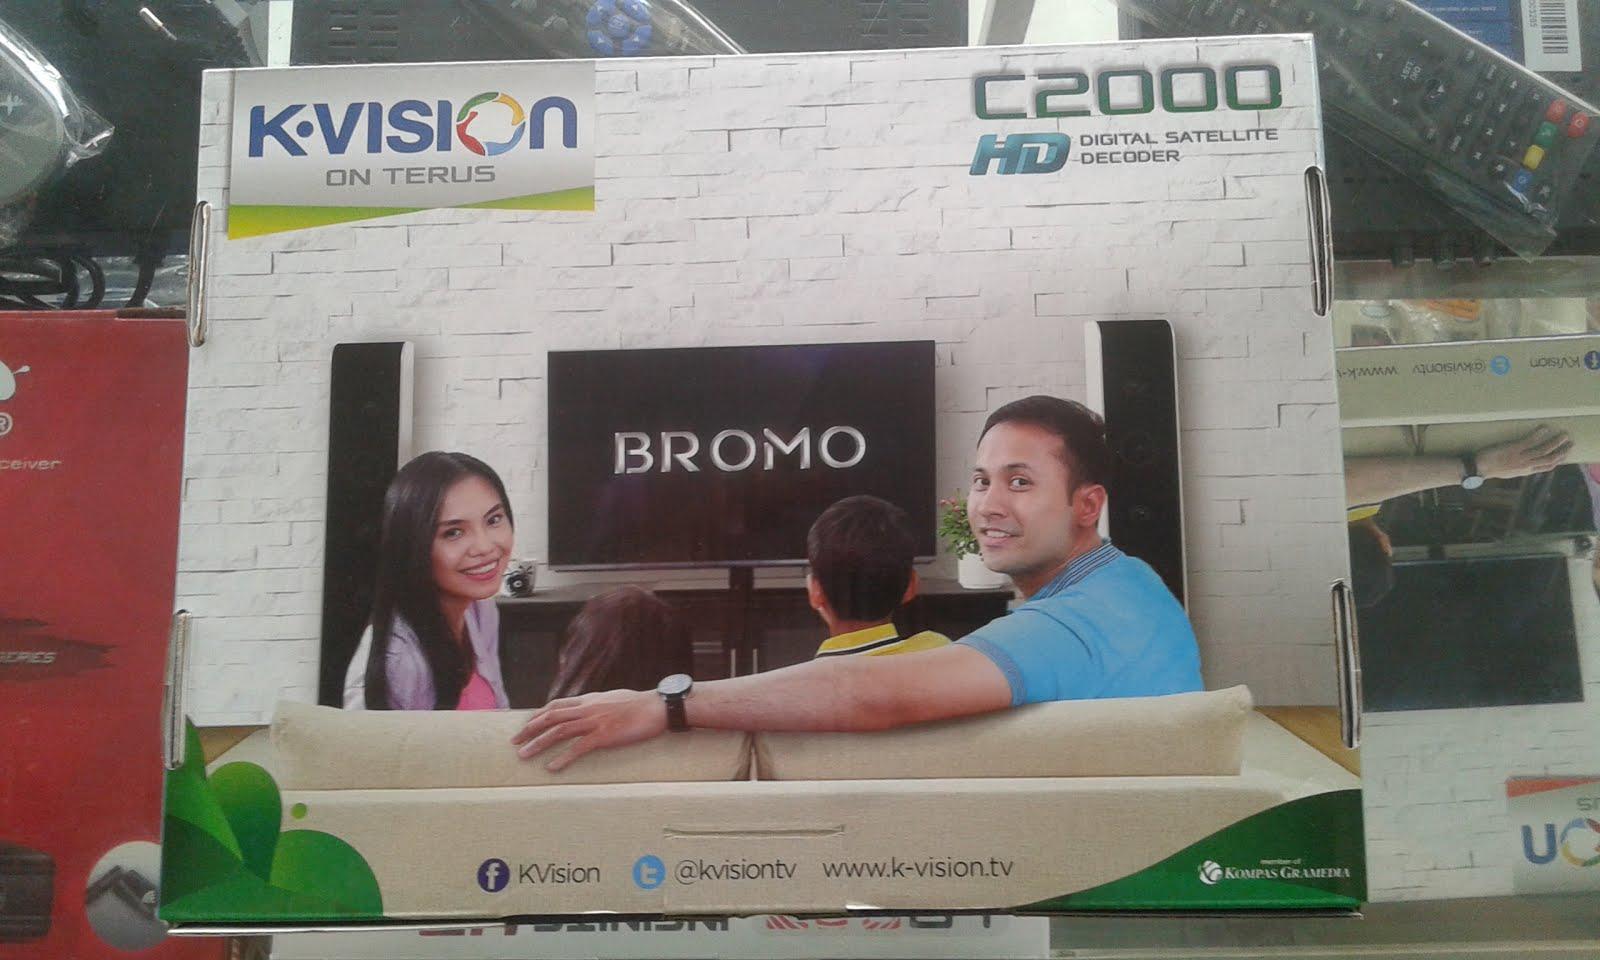 K-VISION C2000